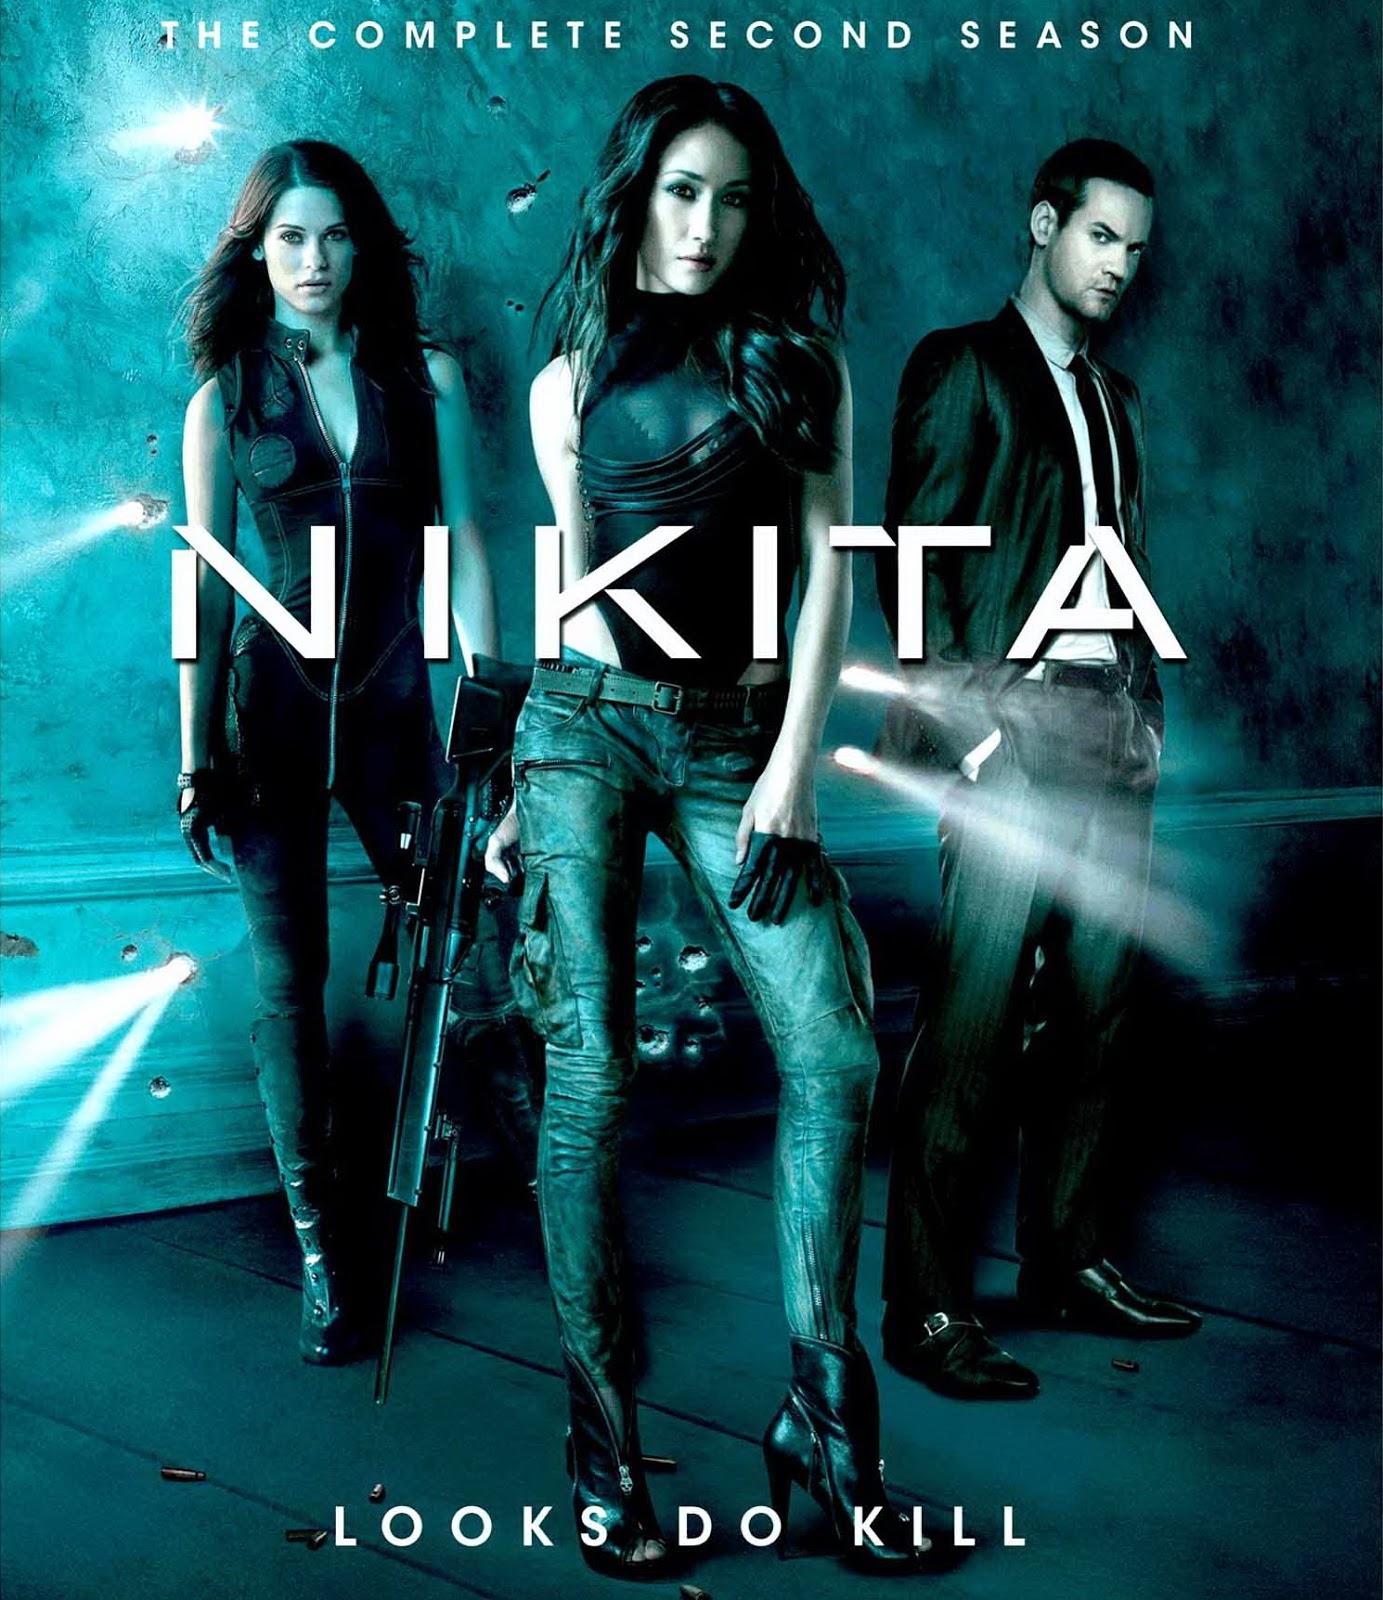 Nikita Season 3 นิกิต้า รหัสเธอโคตรเพชรฆาต ปี 3 [พากย์ไทย]